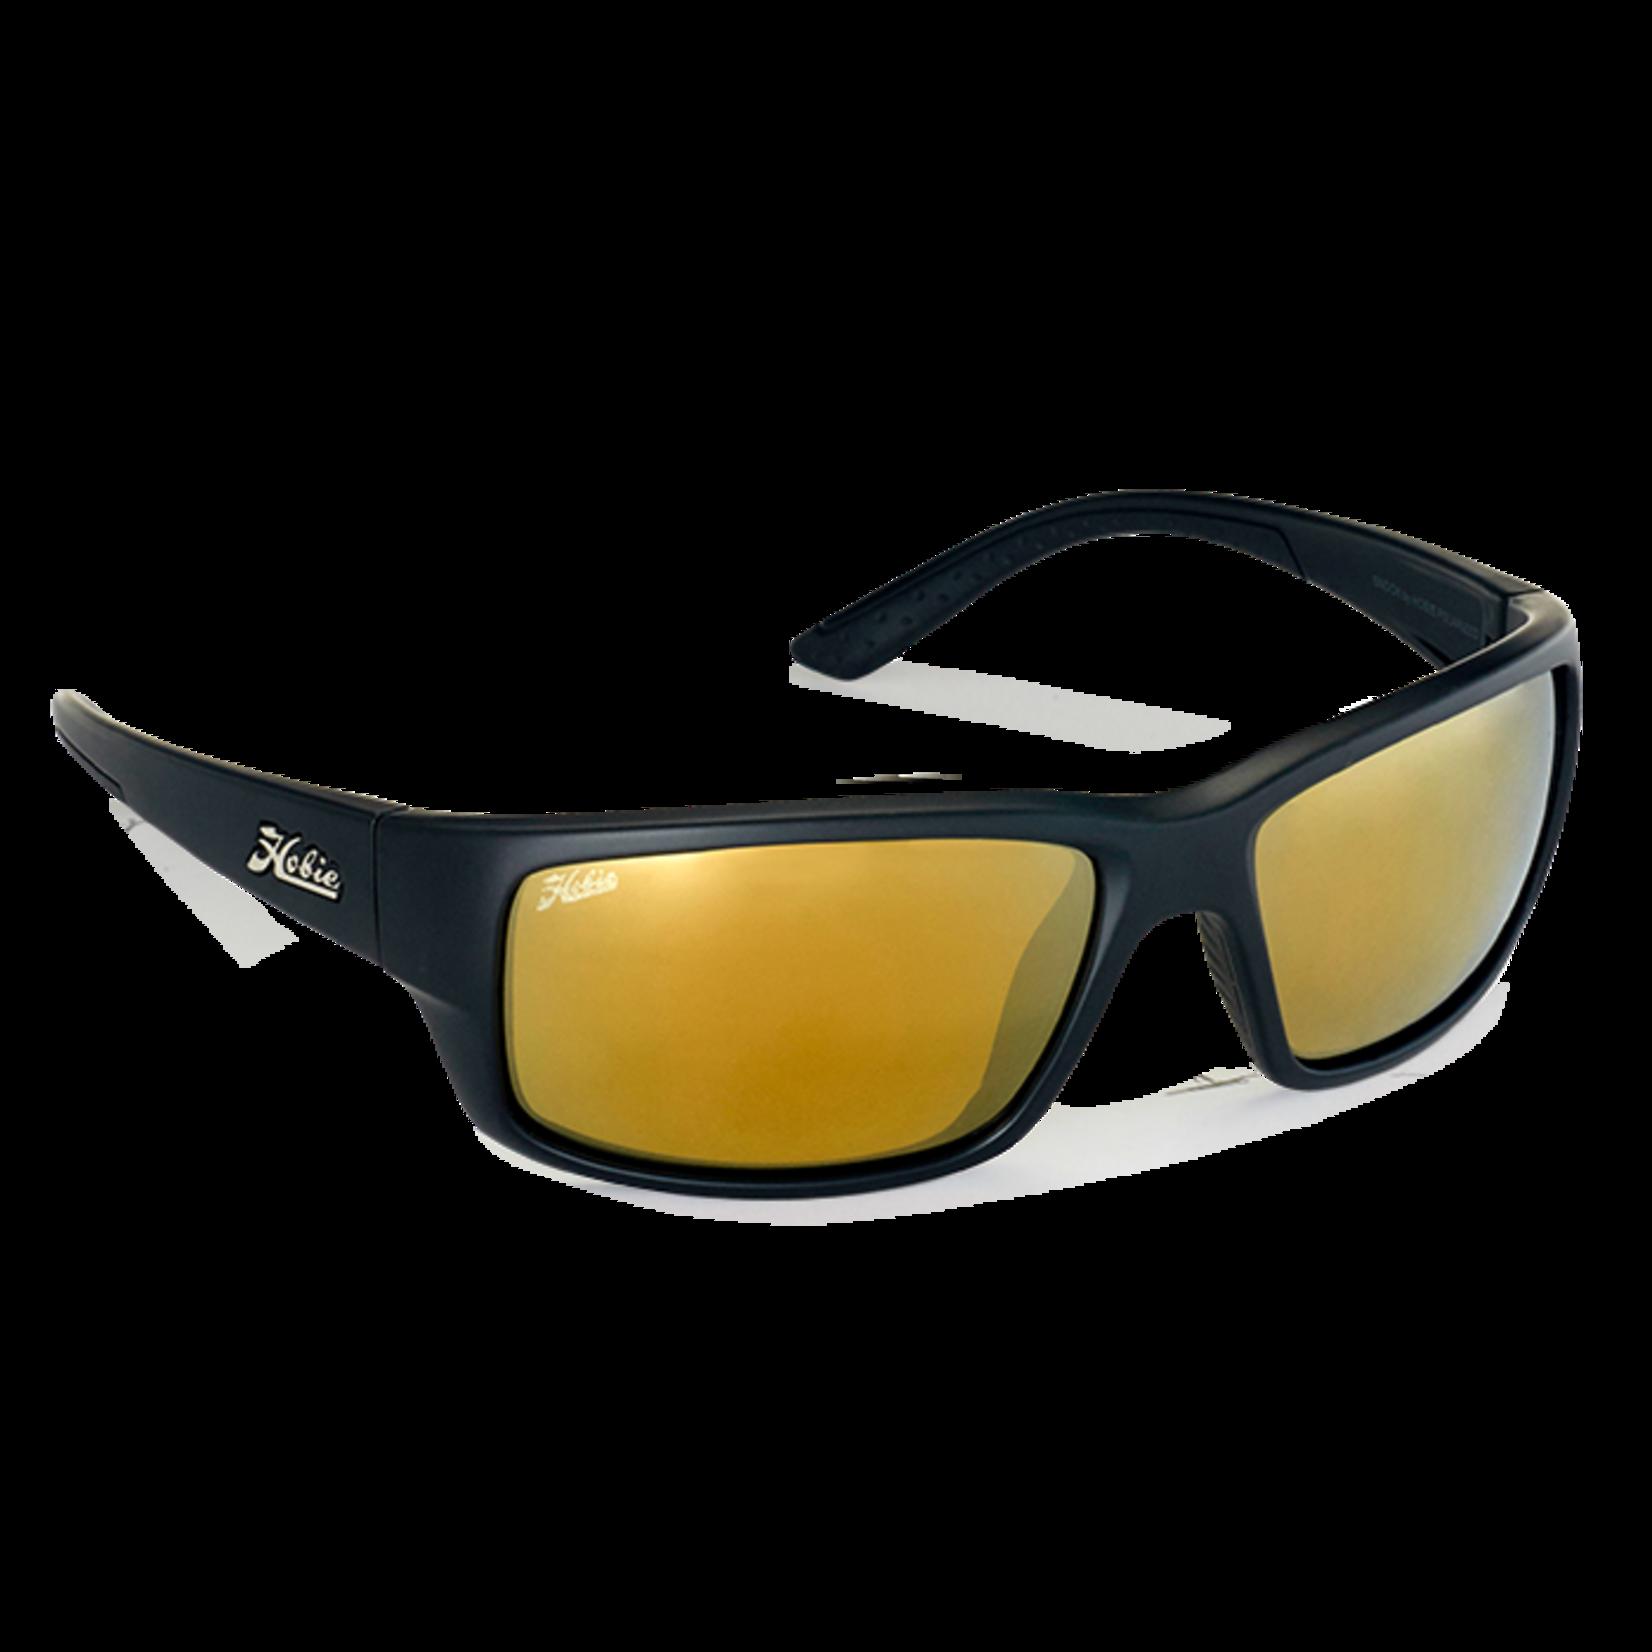 Hobie Polarized Hobie Polarized Sunglasses Snook